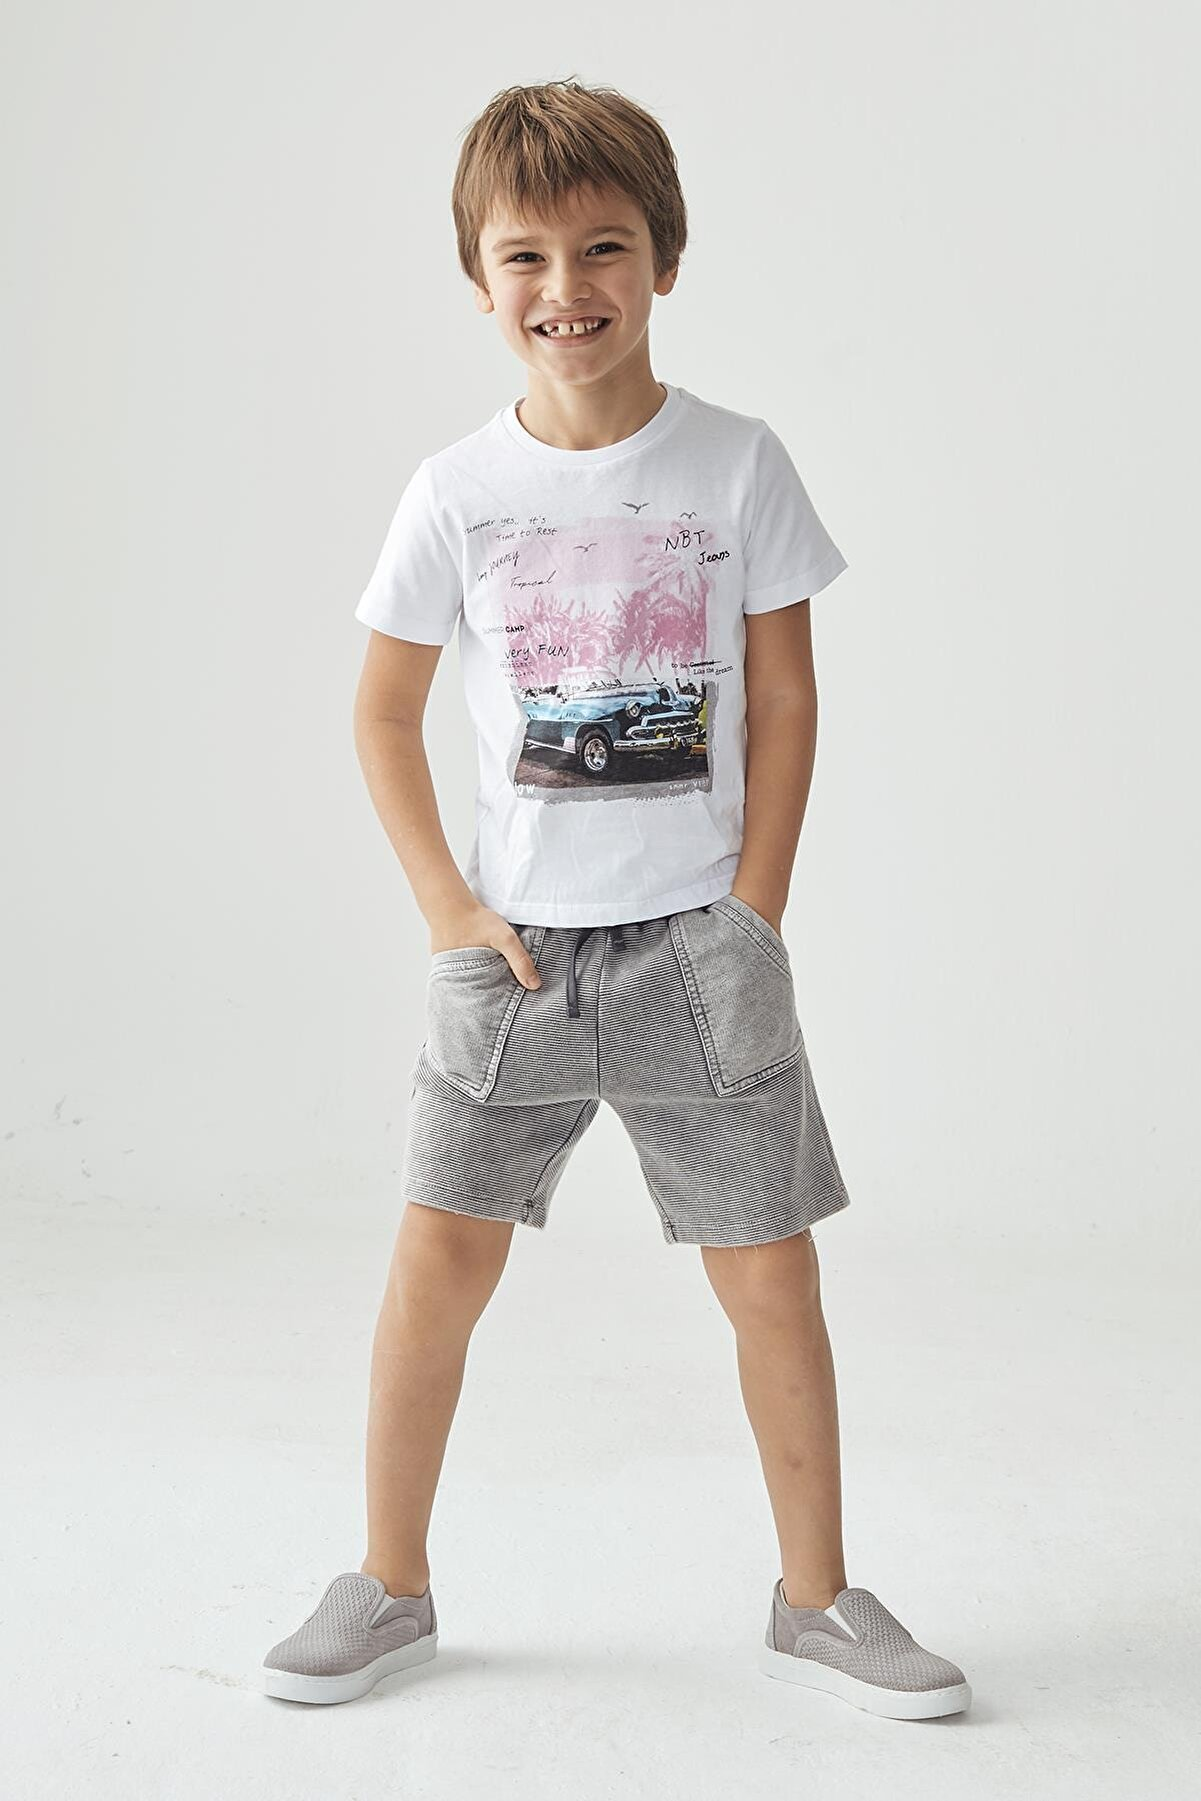 Nebbati Erkek Çocuk Beyaz T-shirt